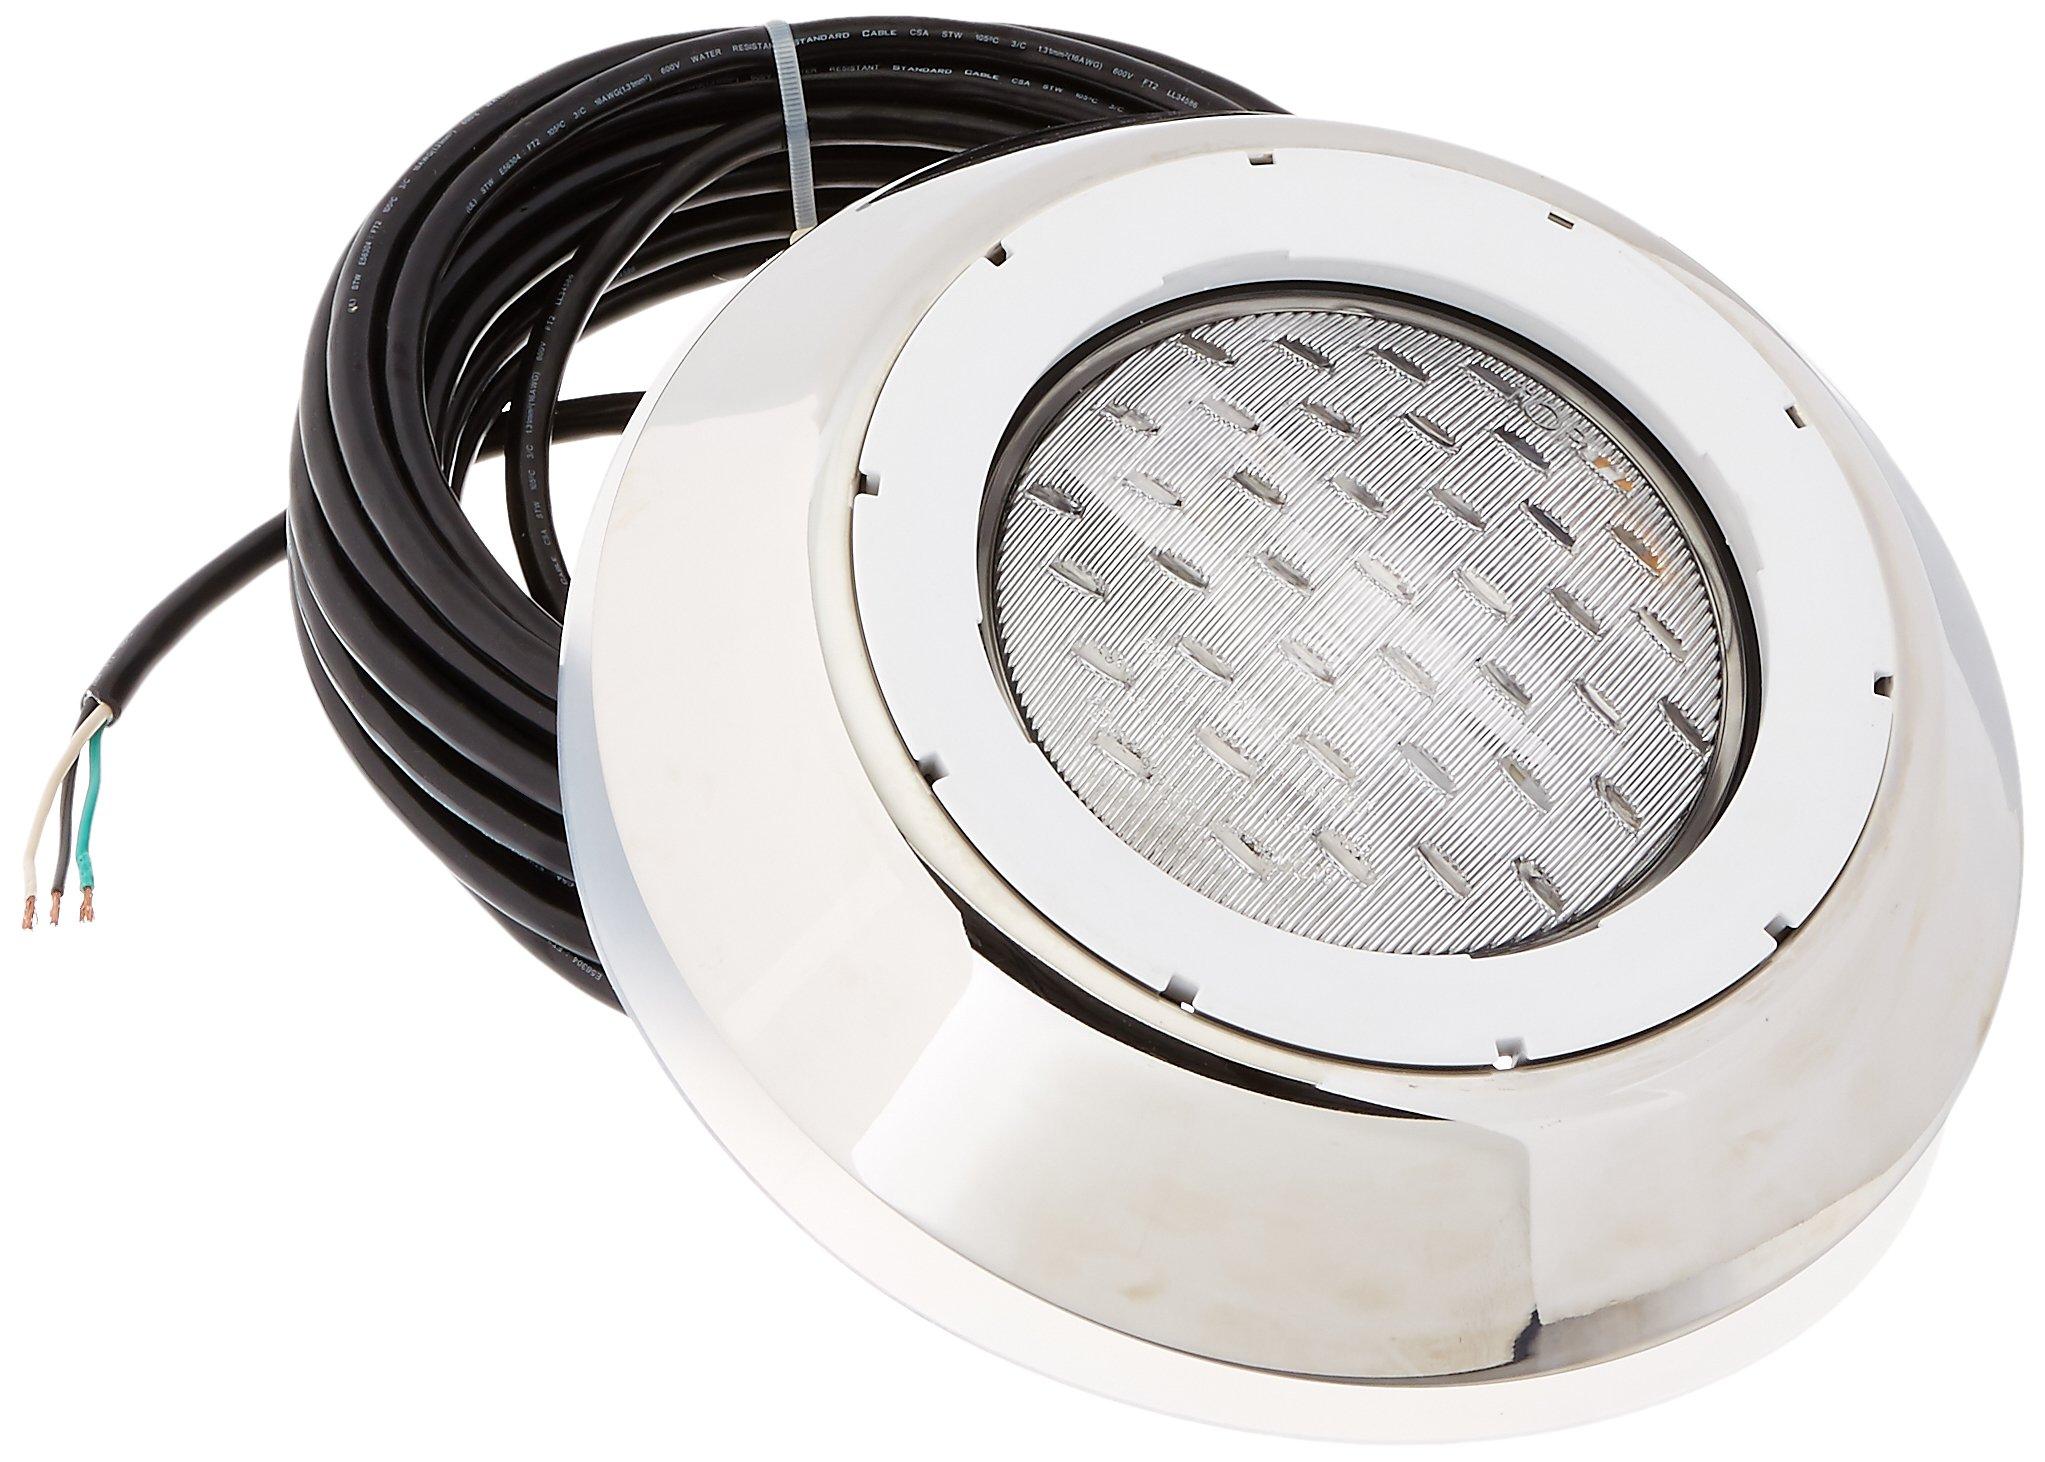 100-Watt Pentair 78873500 AquaLumin III Nicheless Vinyl Liner Pool and Spa Light 12-Volt 50-Feet Cord Length